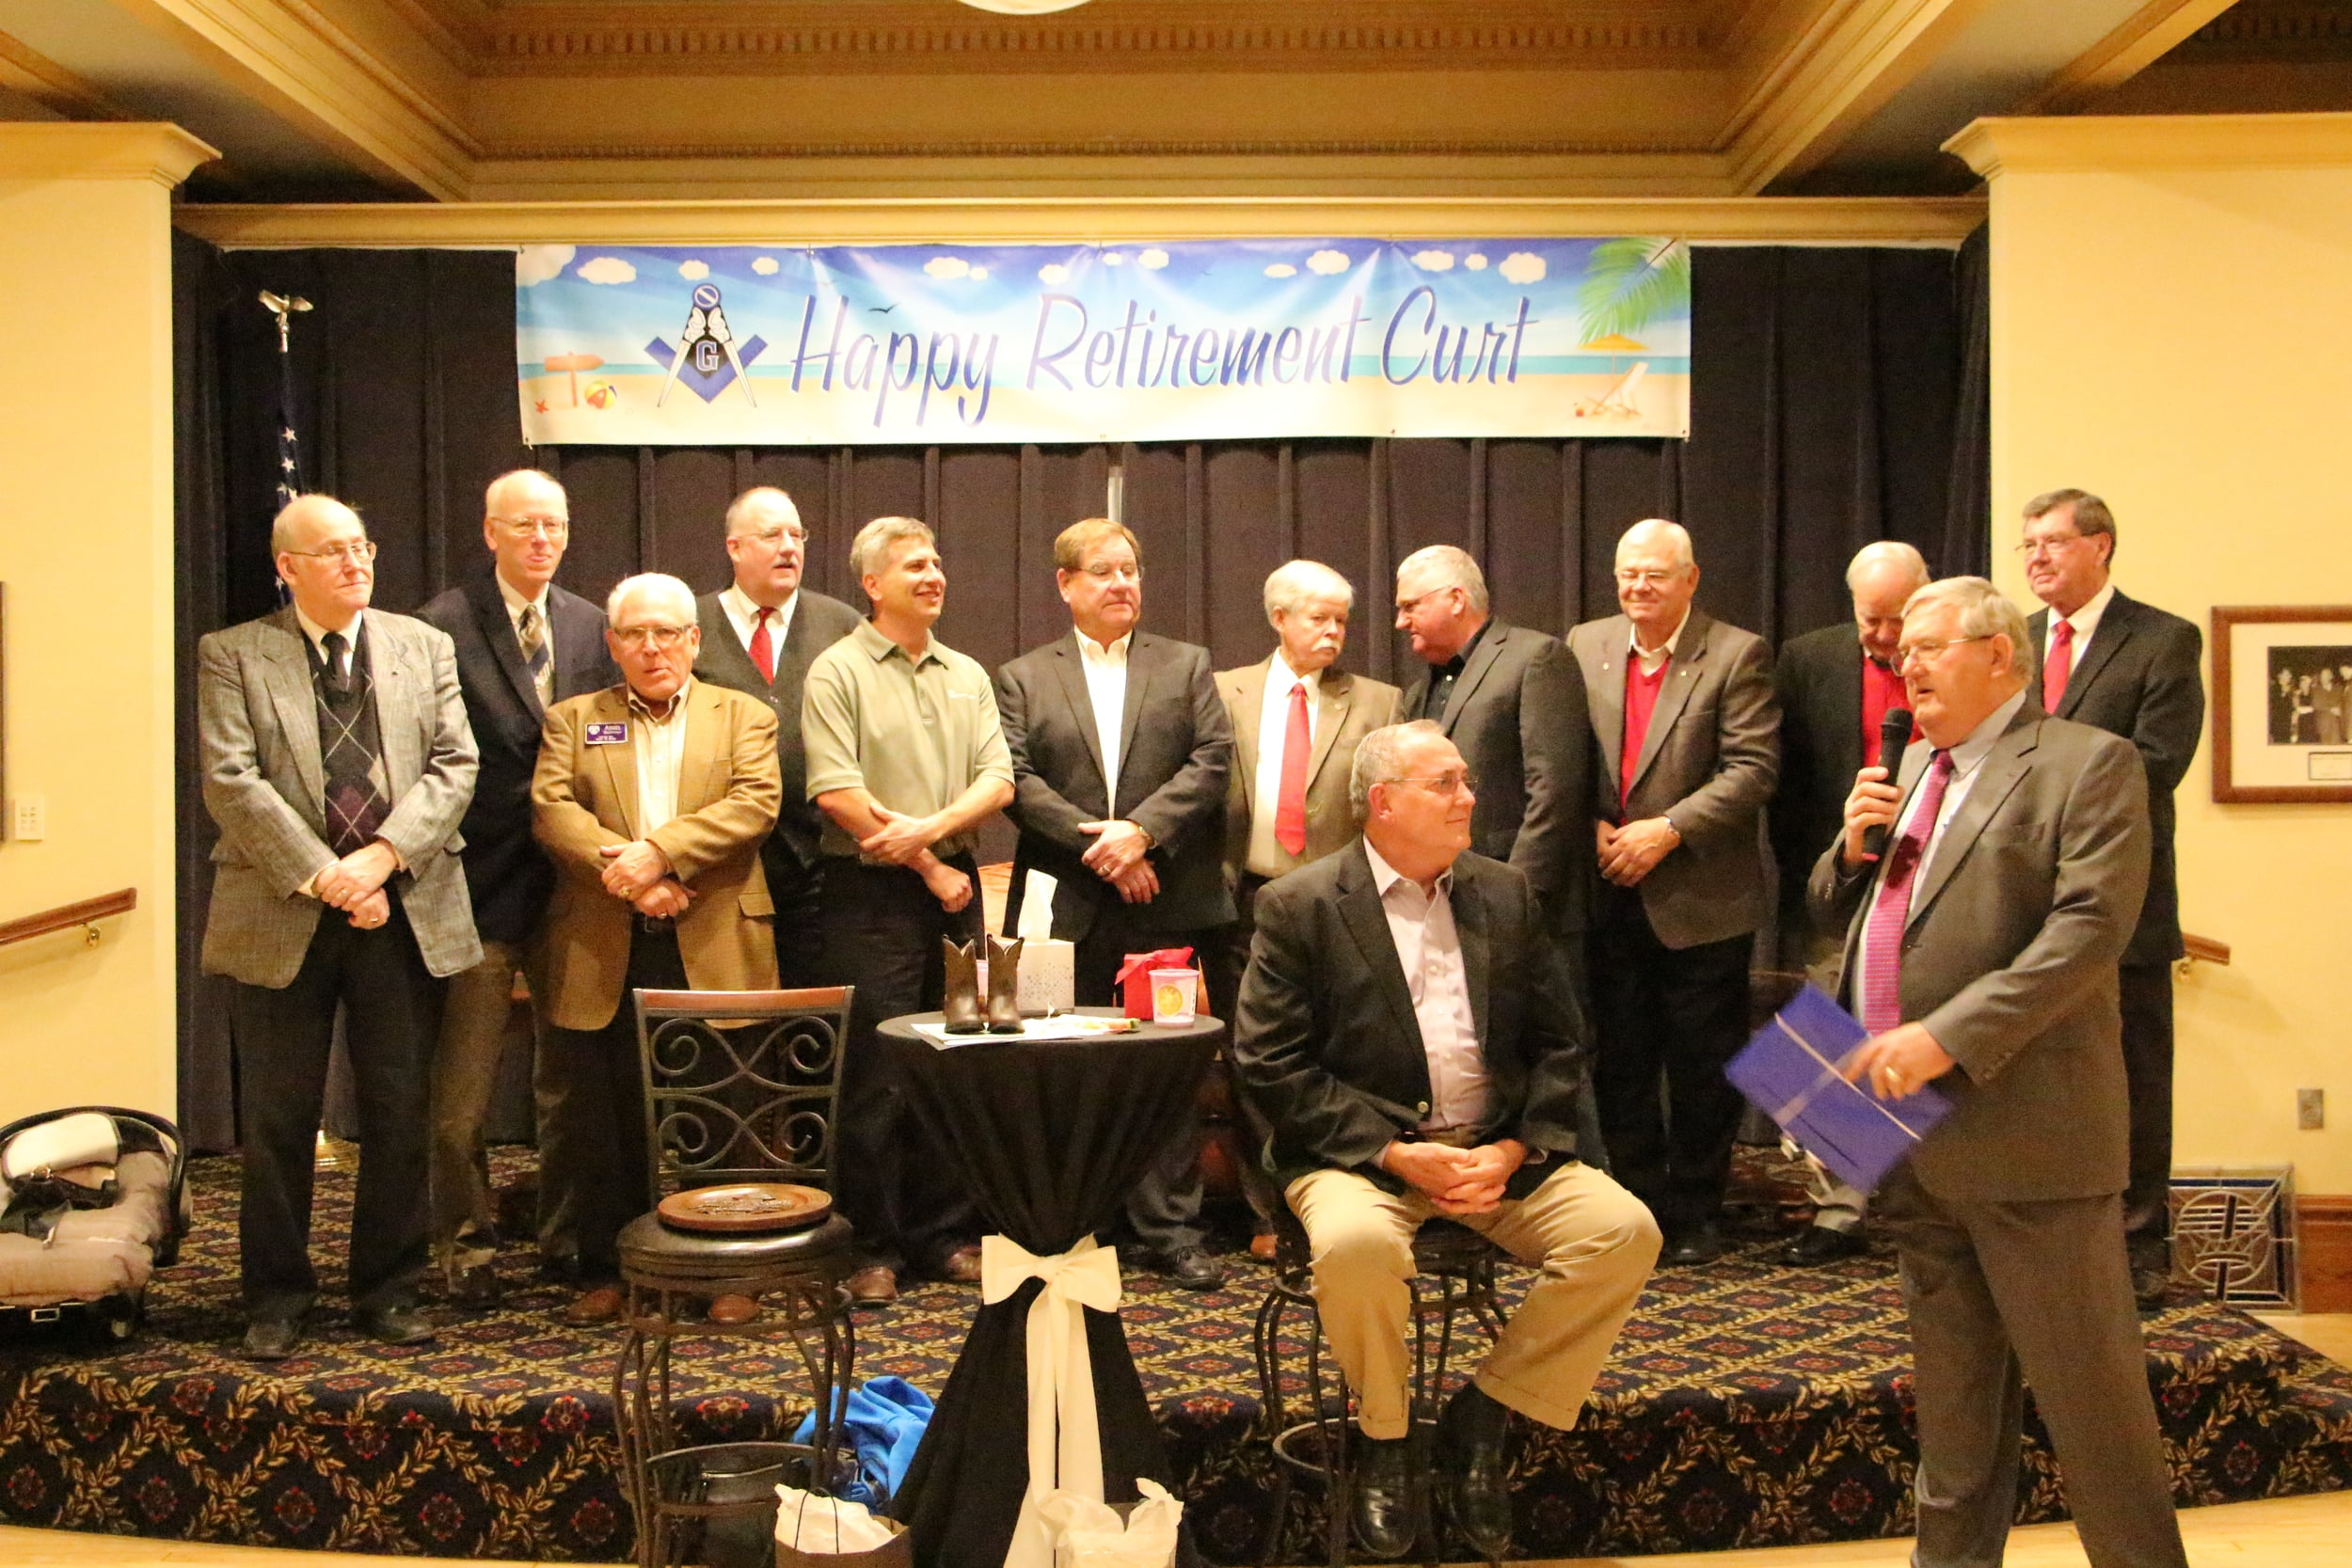 Cathedral Board presenting Curt and Carol an Alaskan cruise